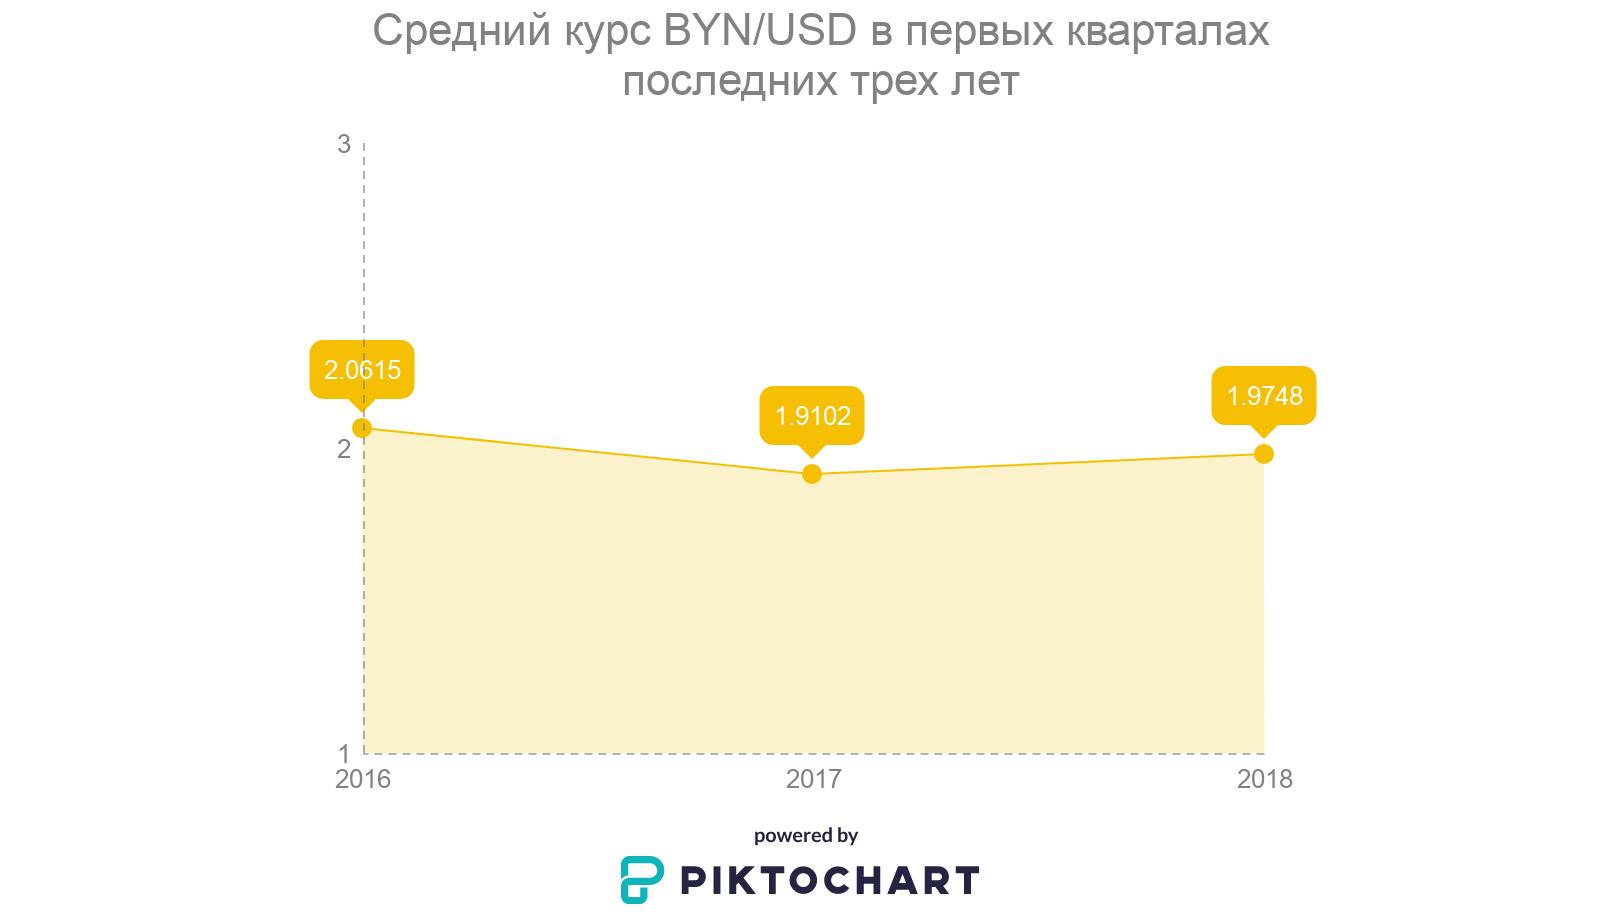 Средний курс BYN/USD в первых кварталах последних трех лет